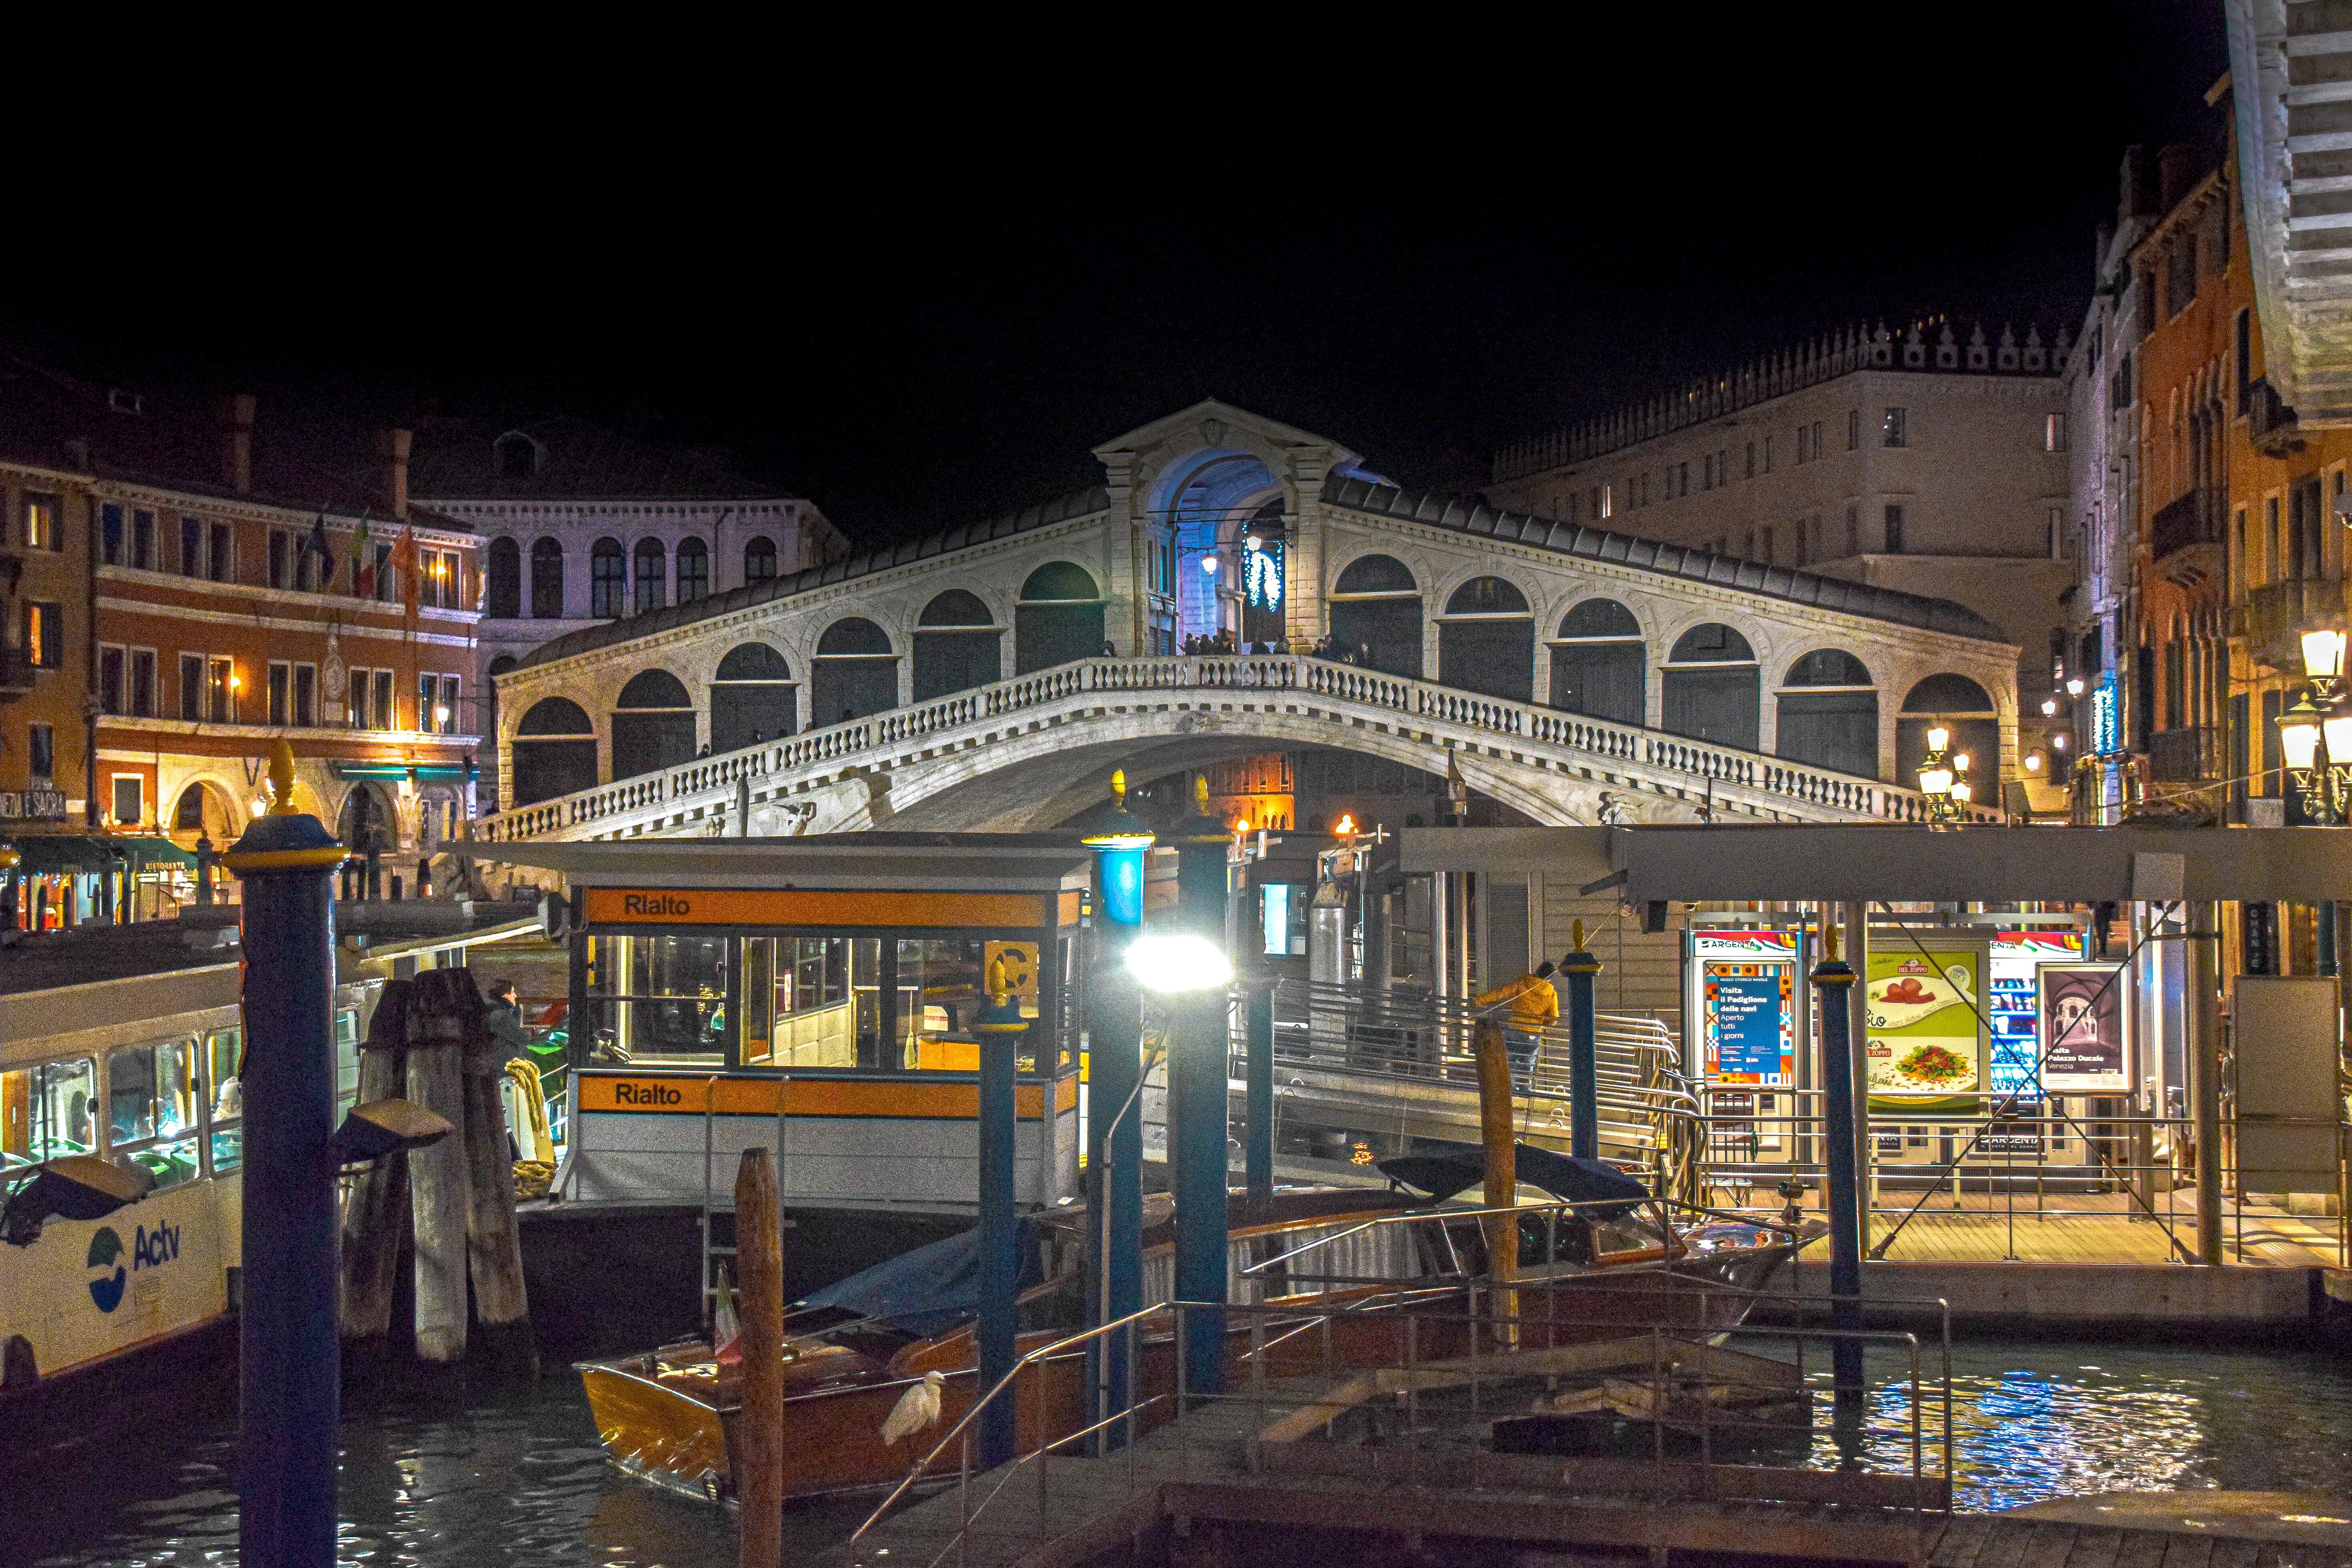 5 things to do on Rialto bridge